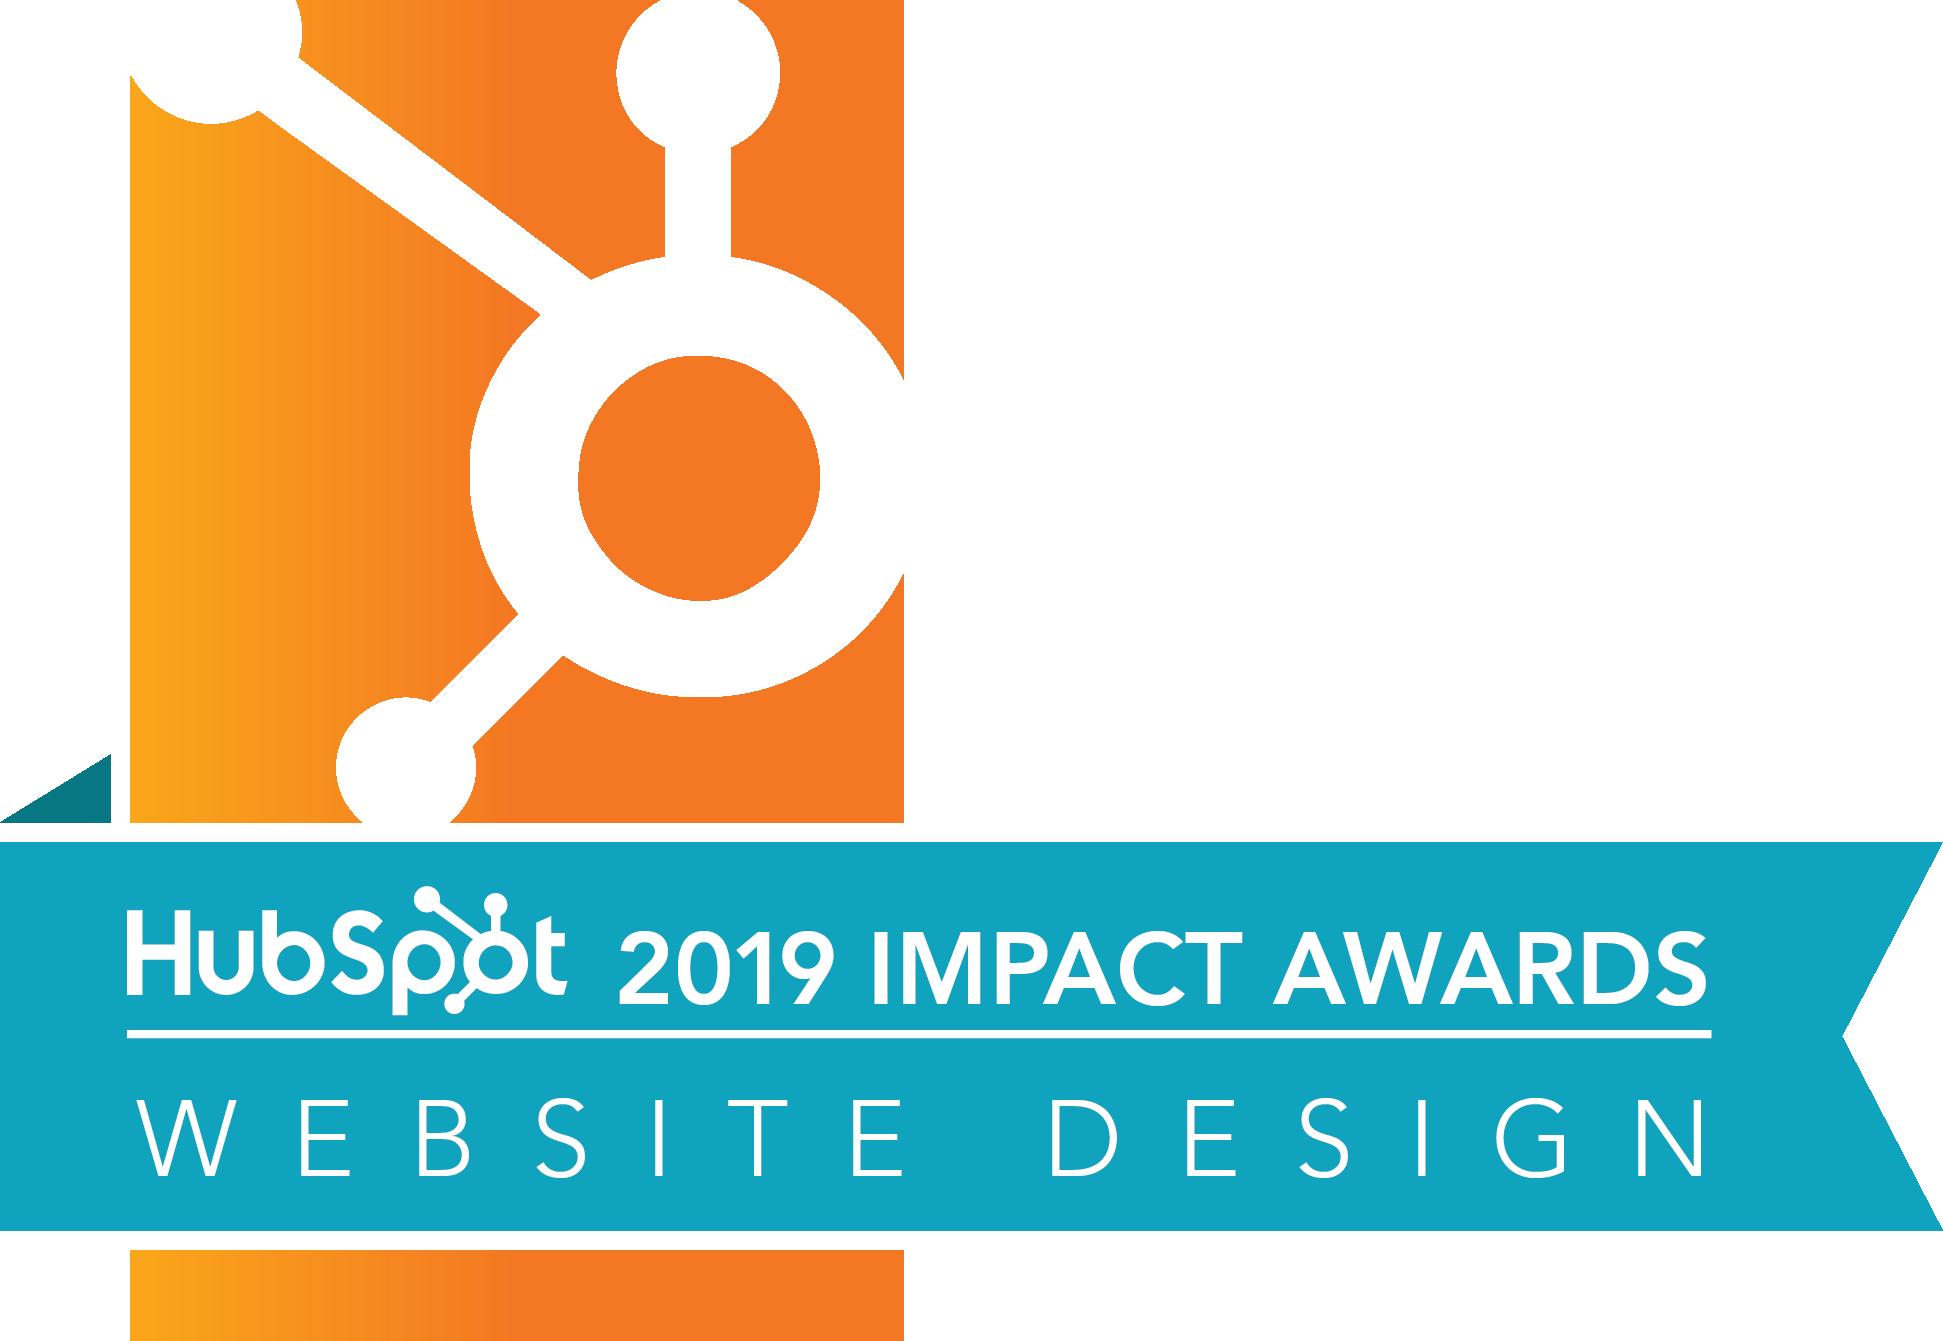 2019 Website Design Award